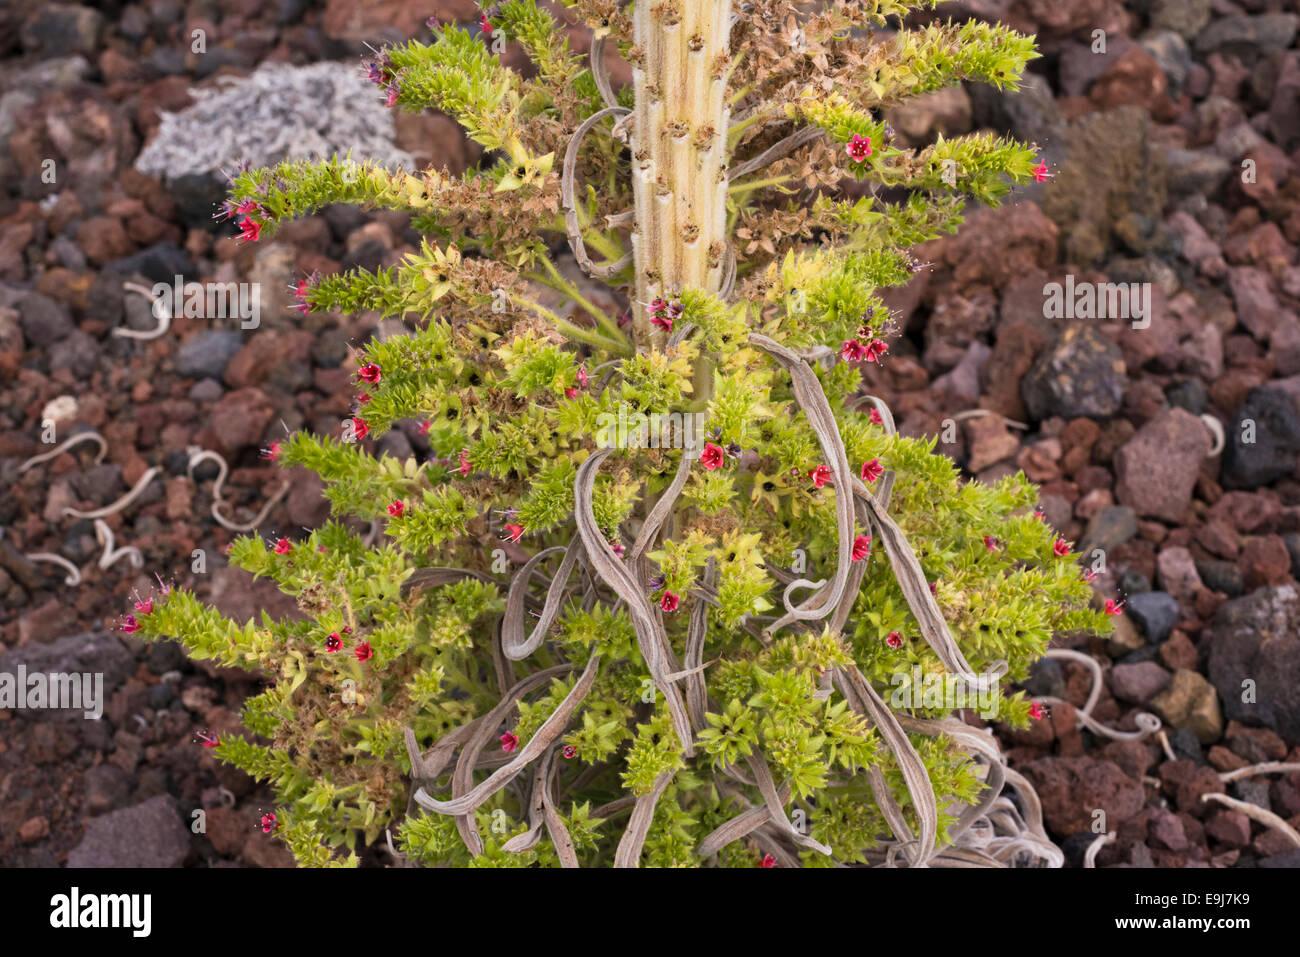 The base of a taginaste rojo (Echium wildpretii) plant flowering late on basaltic scoria at Montana Boca Cangrejo, Tenerife Stock Photo